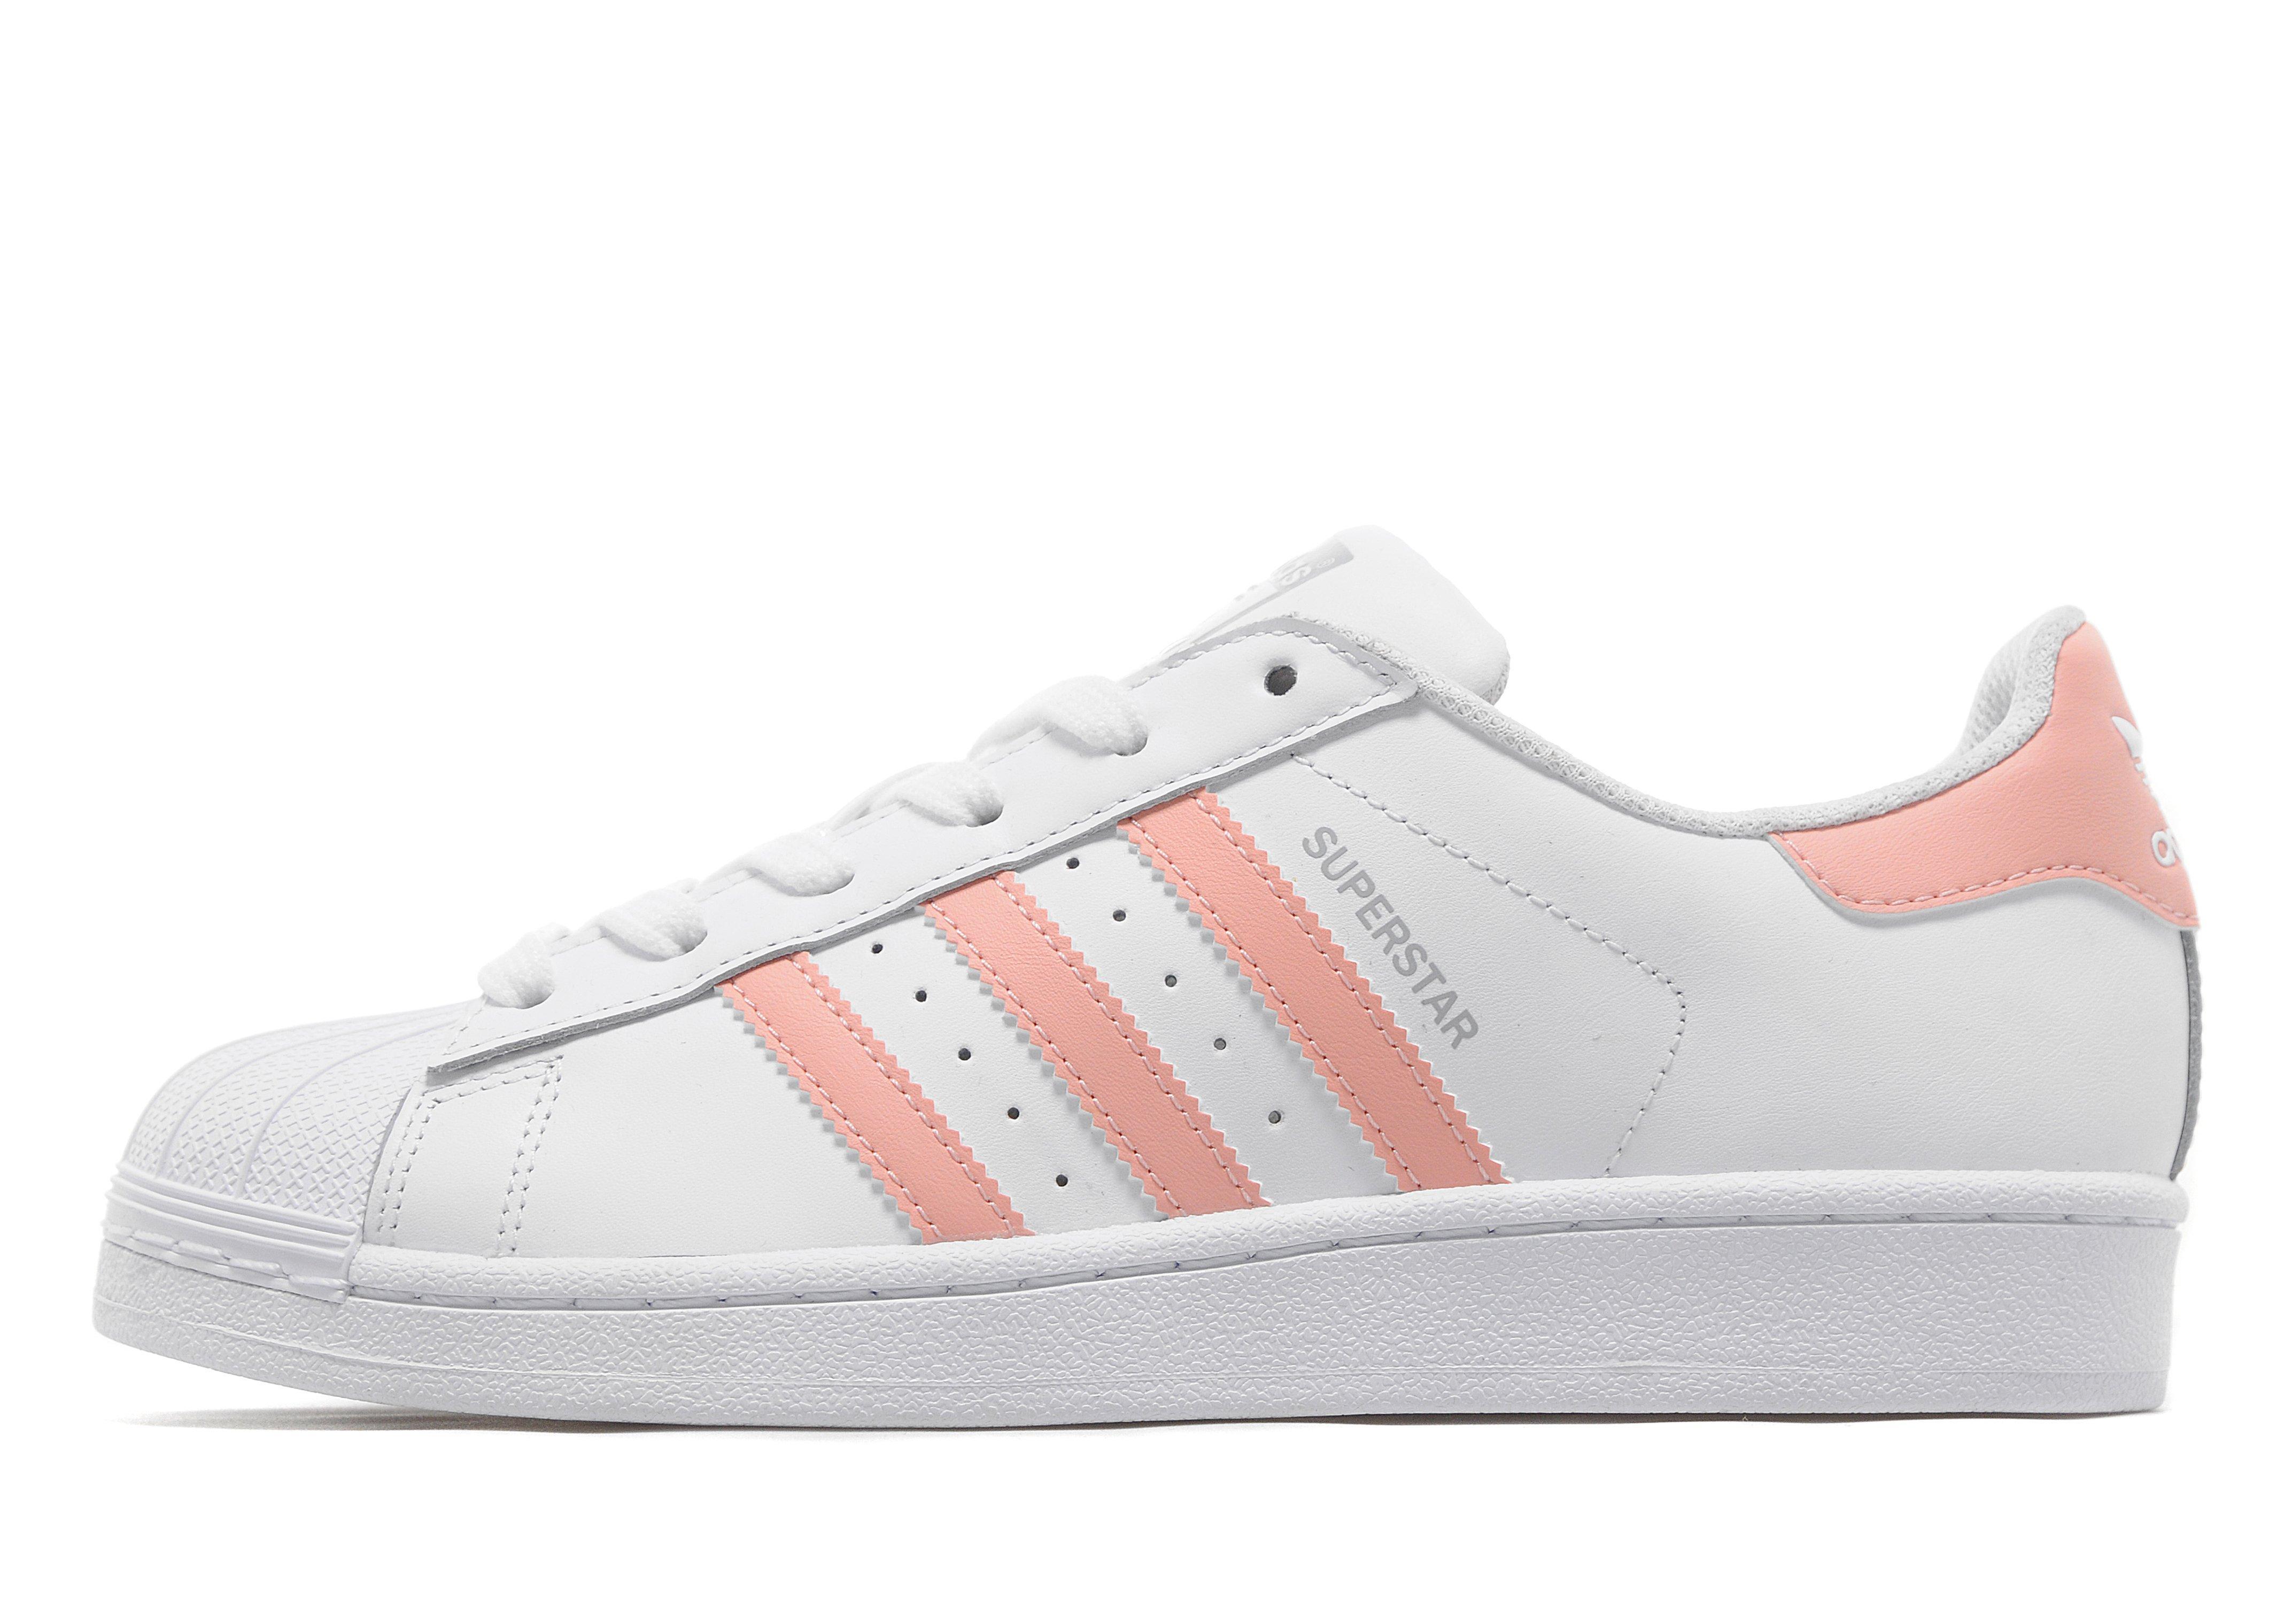 a11e7774ebe adidas superstar wit met grijze strepen